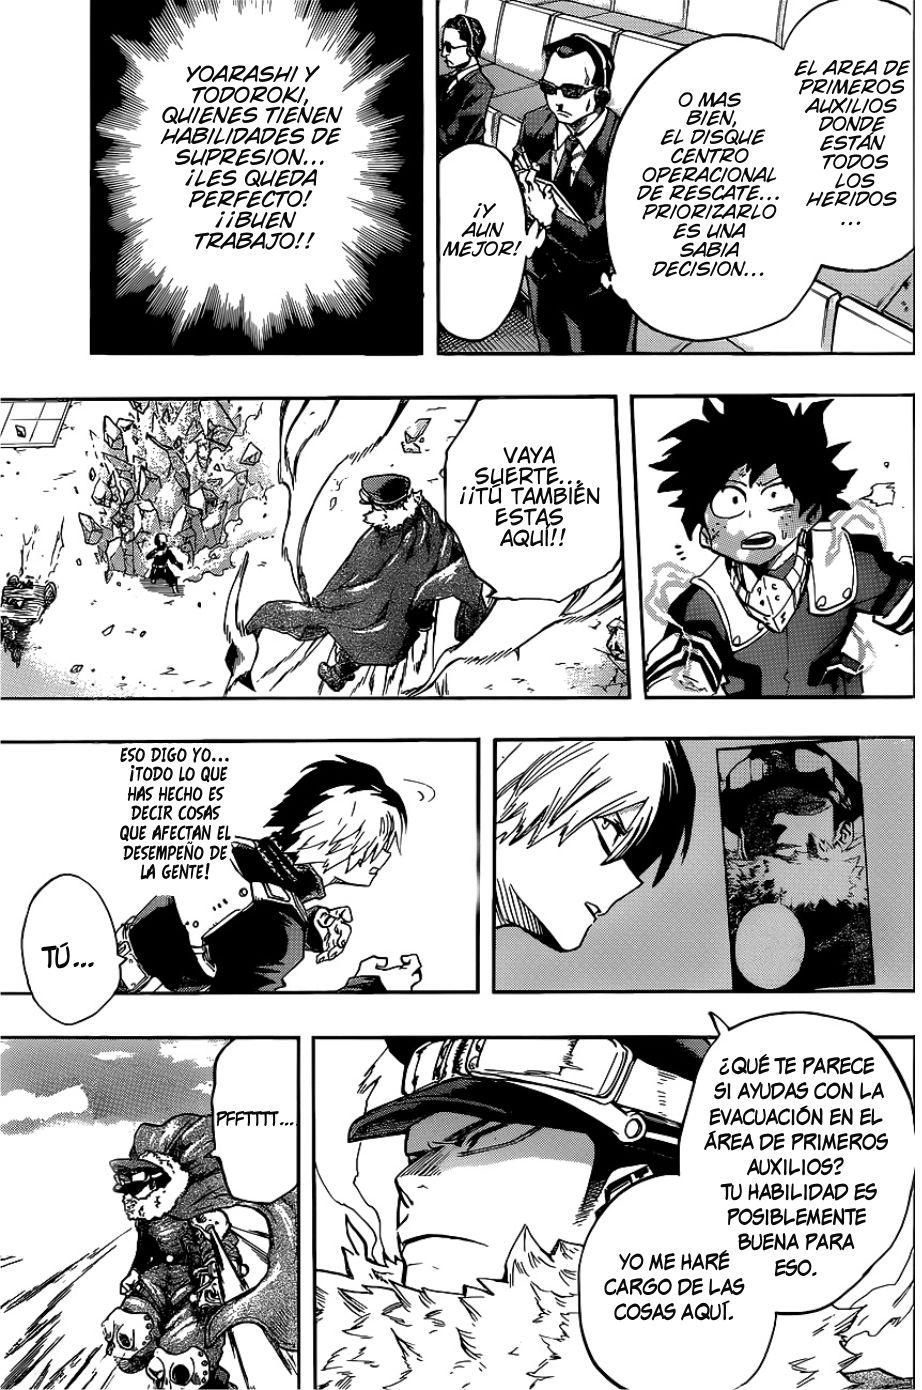 http://c5.ninemanga.com/es_manga/pic2/54/182/512380/b6619d3a11a7fa6aeb3f2add64e5cf9d.jpg Page 10